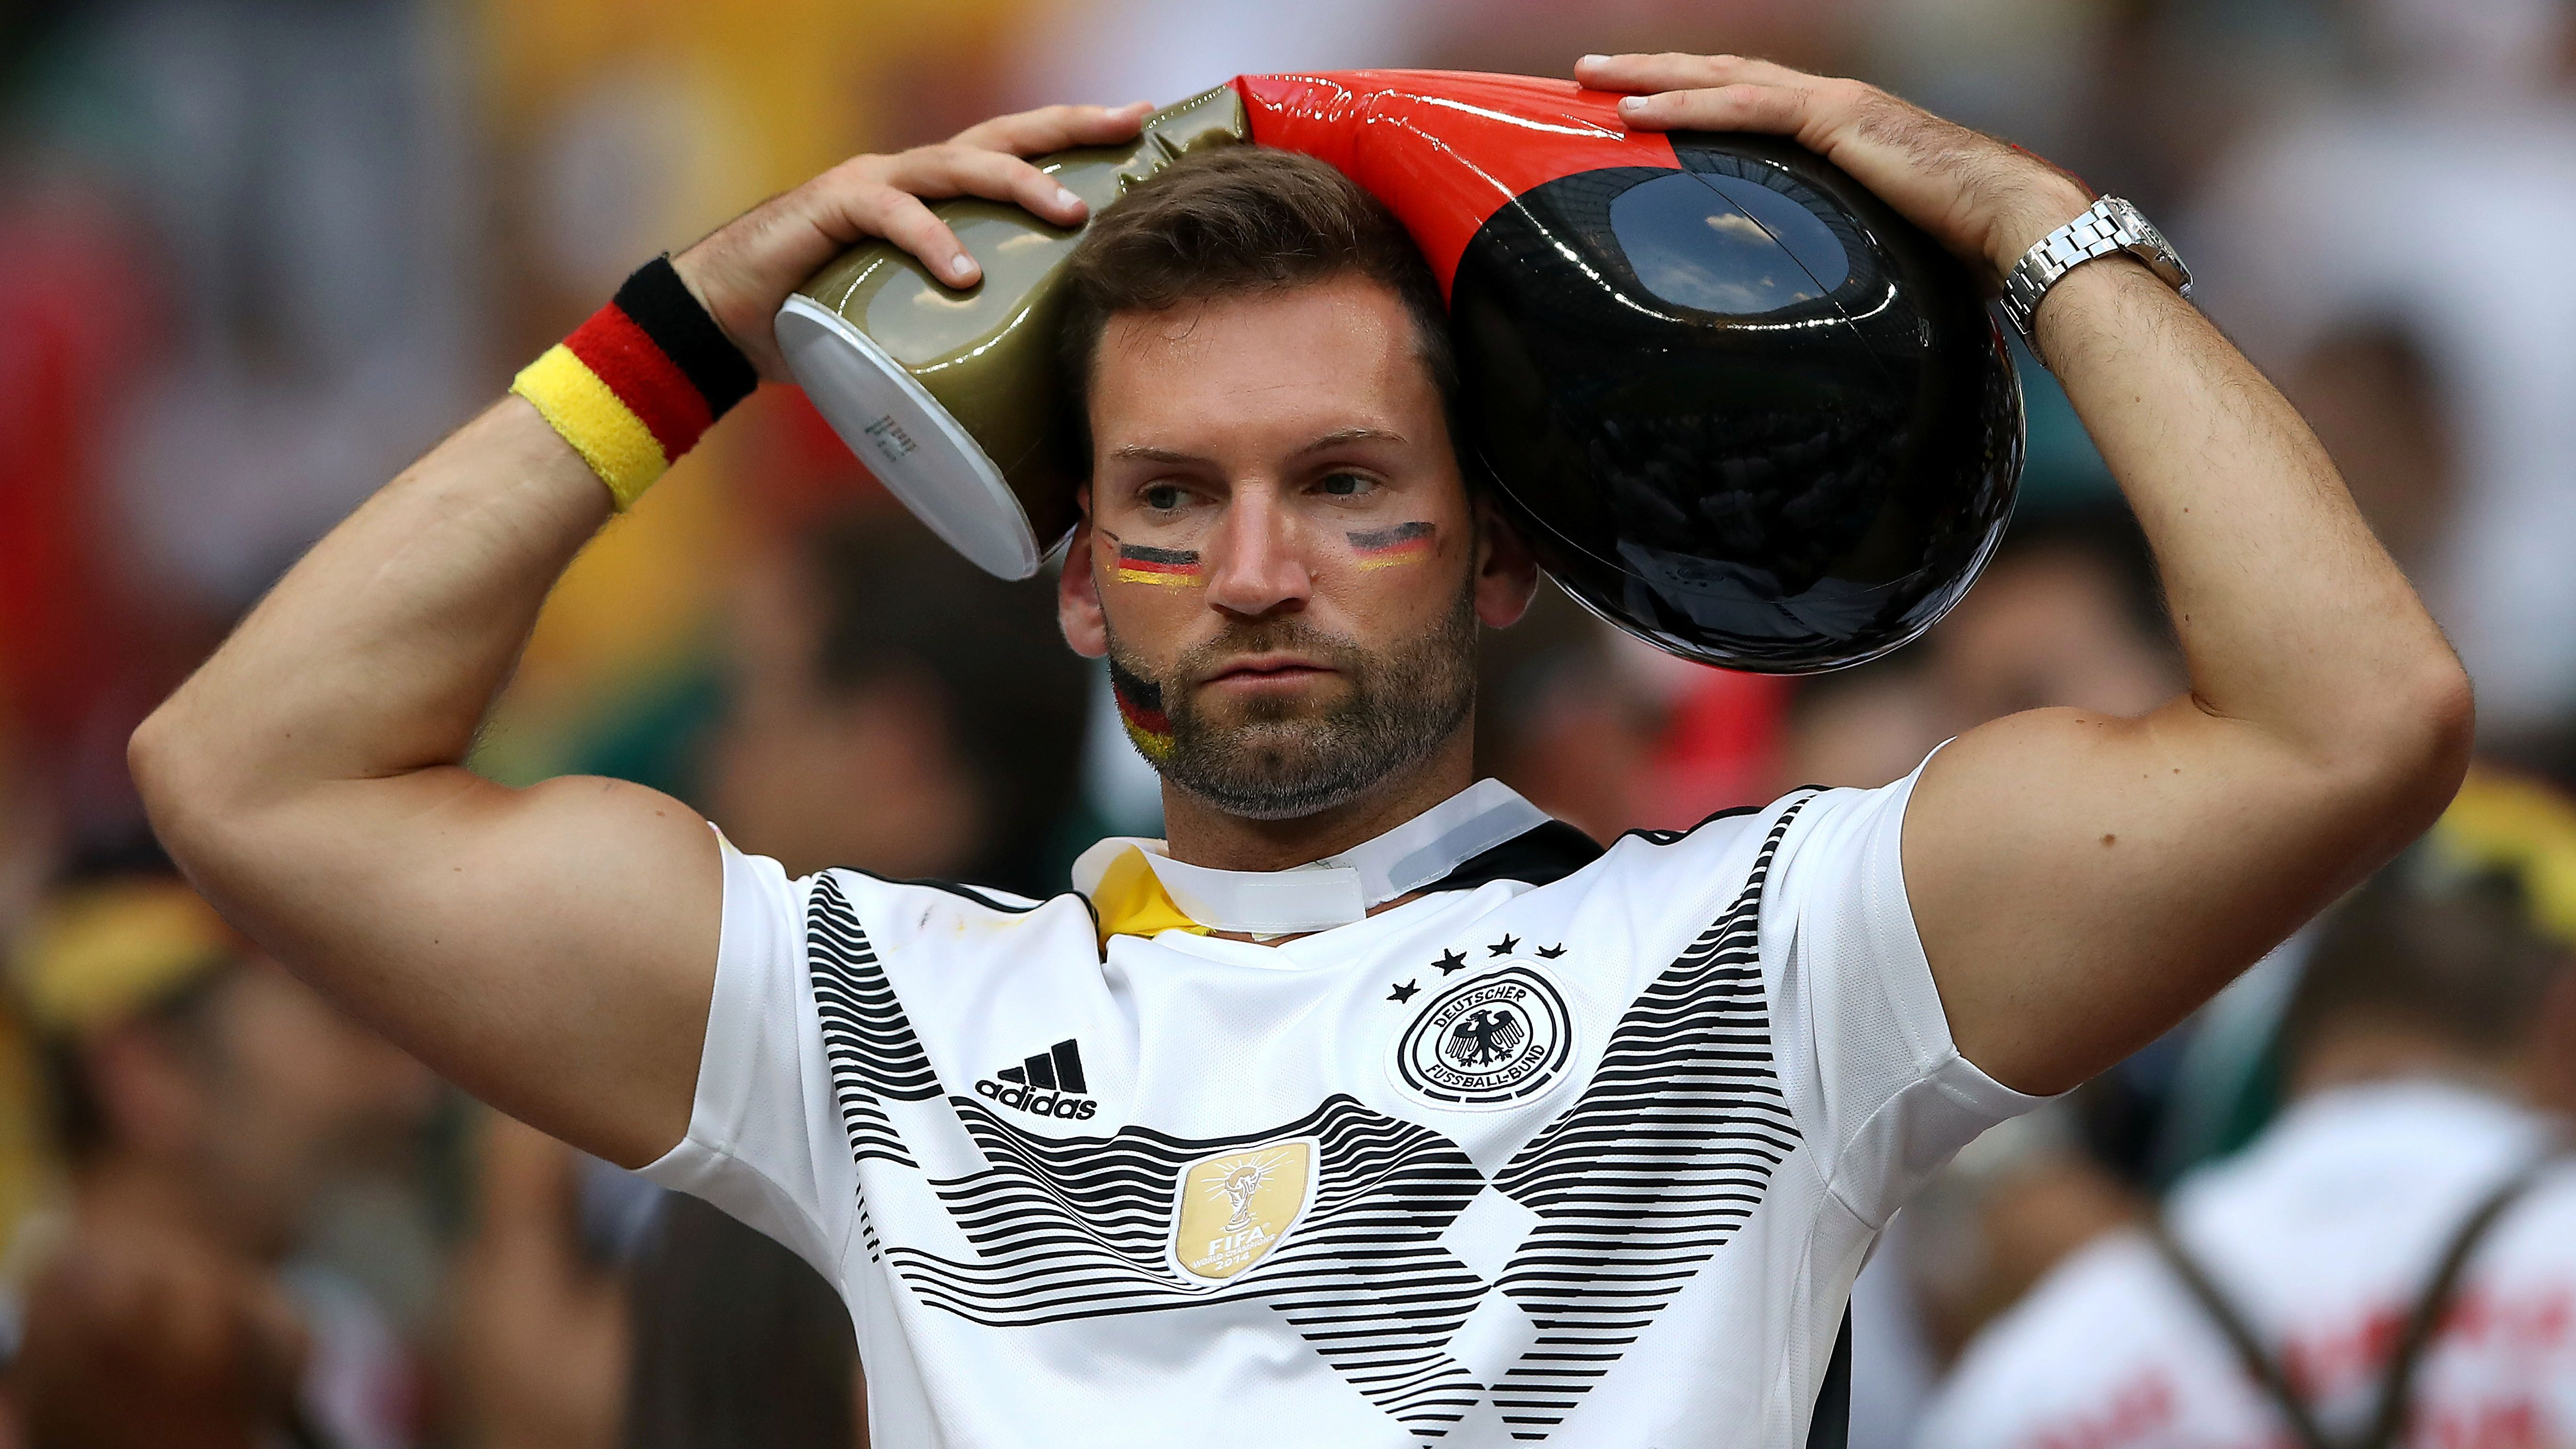 Germany fan looks dejected after the match